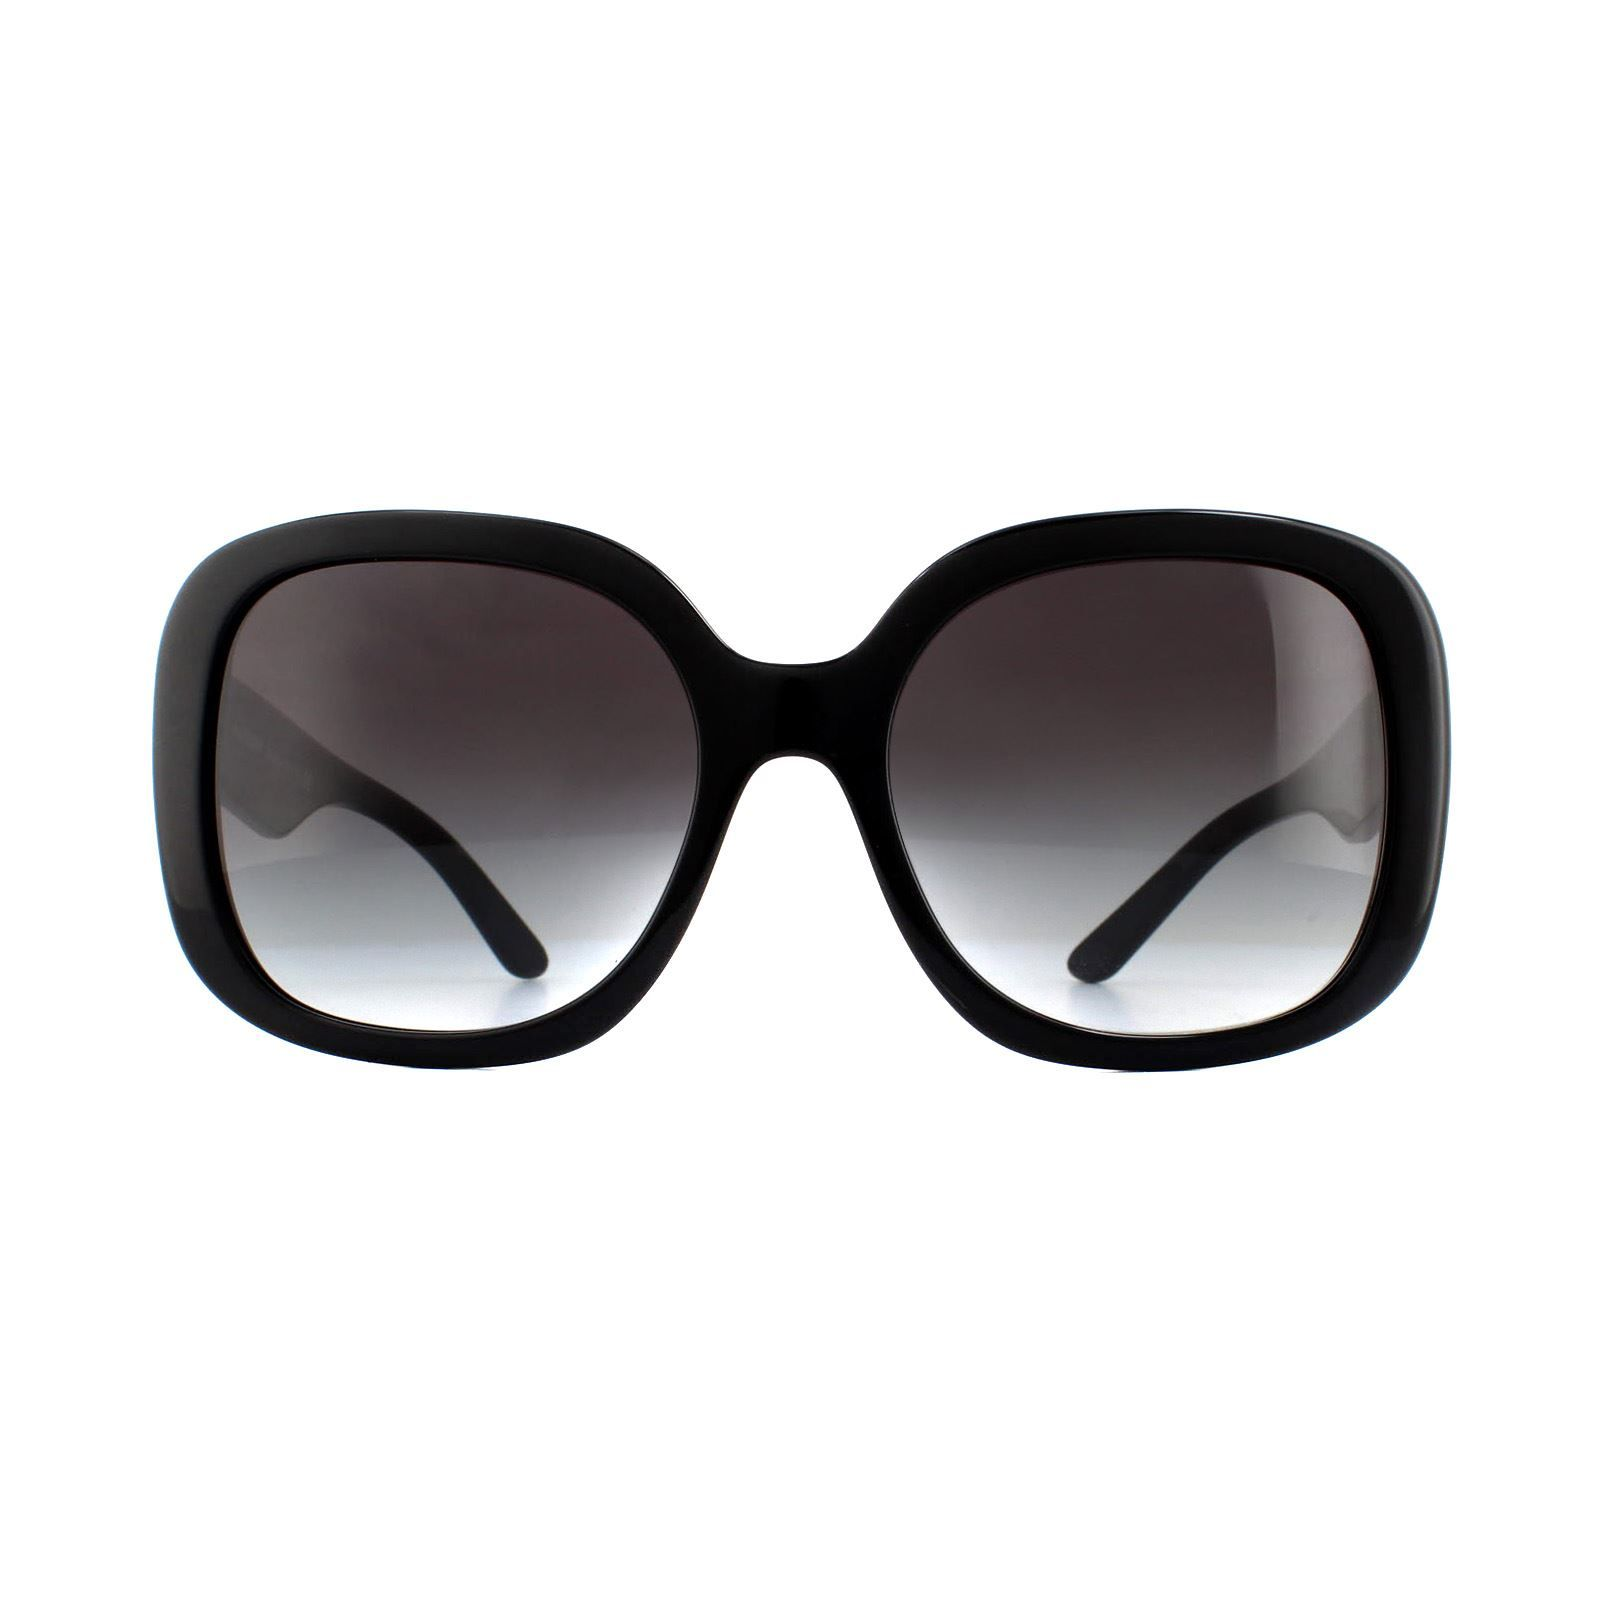 Burberry Sunglasses BE4259 30018G Black Grey Gradient